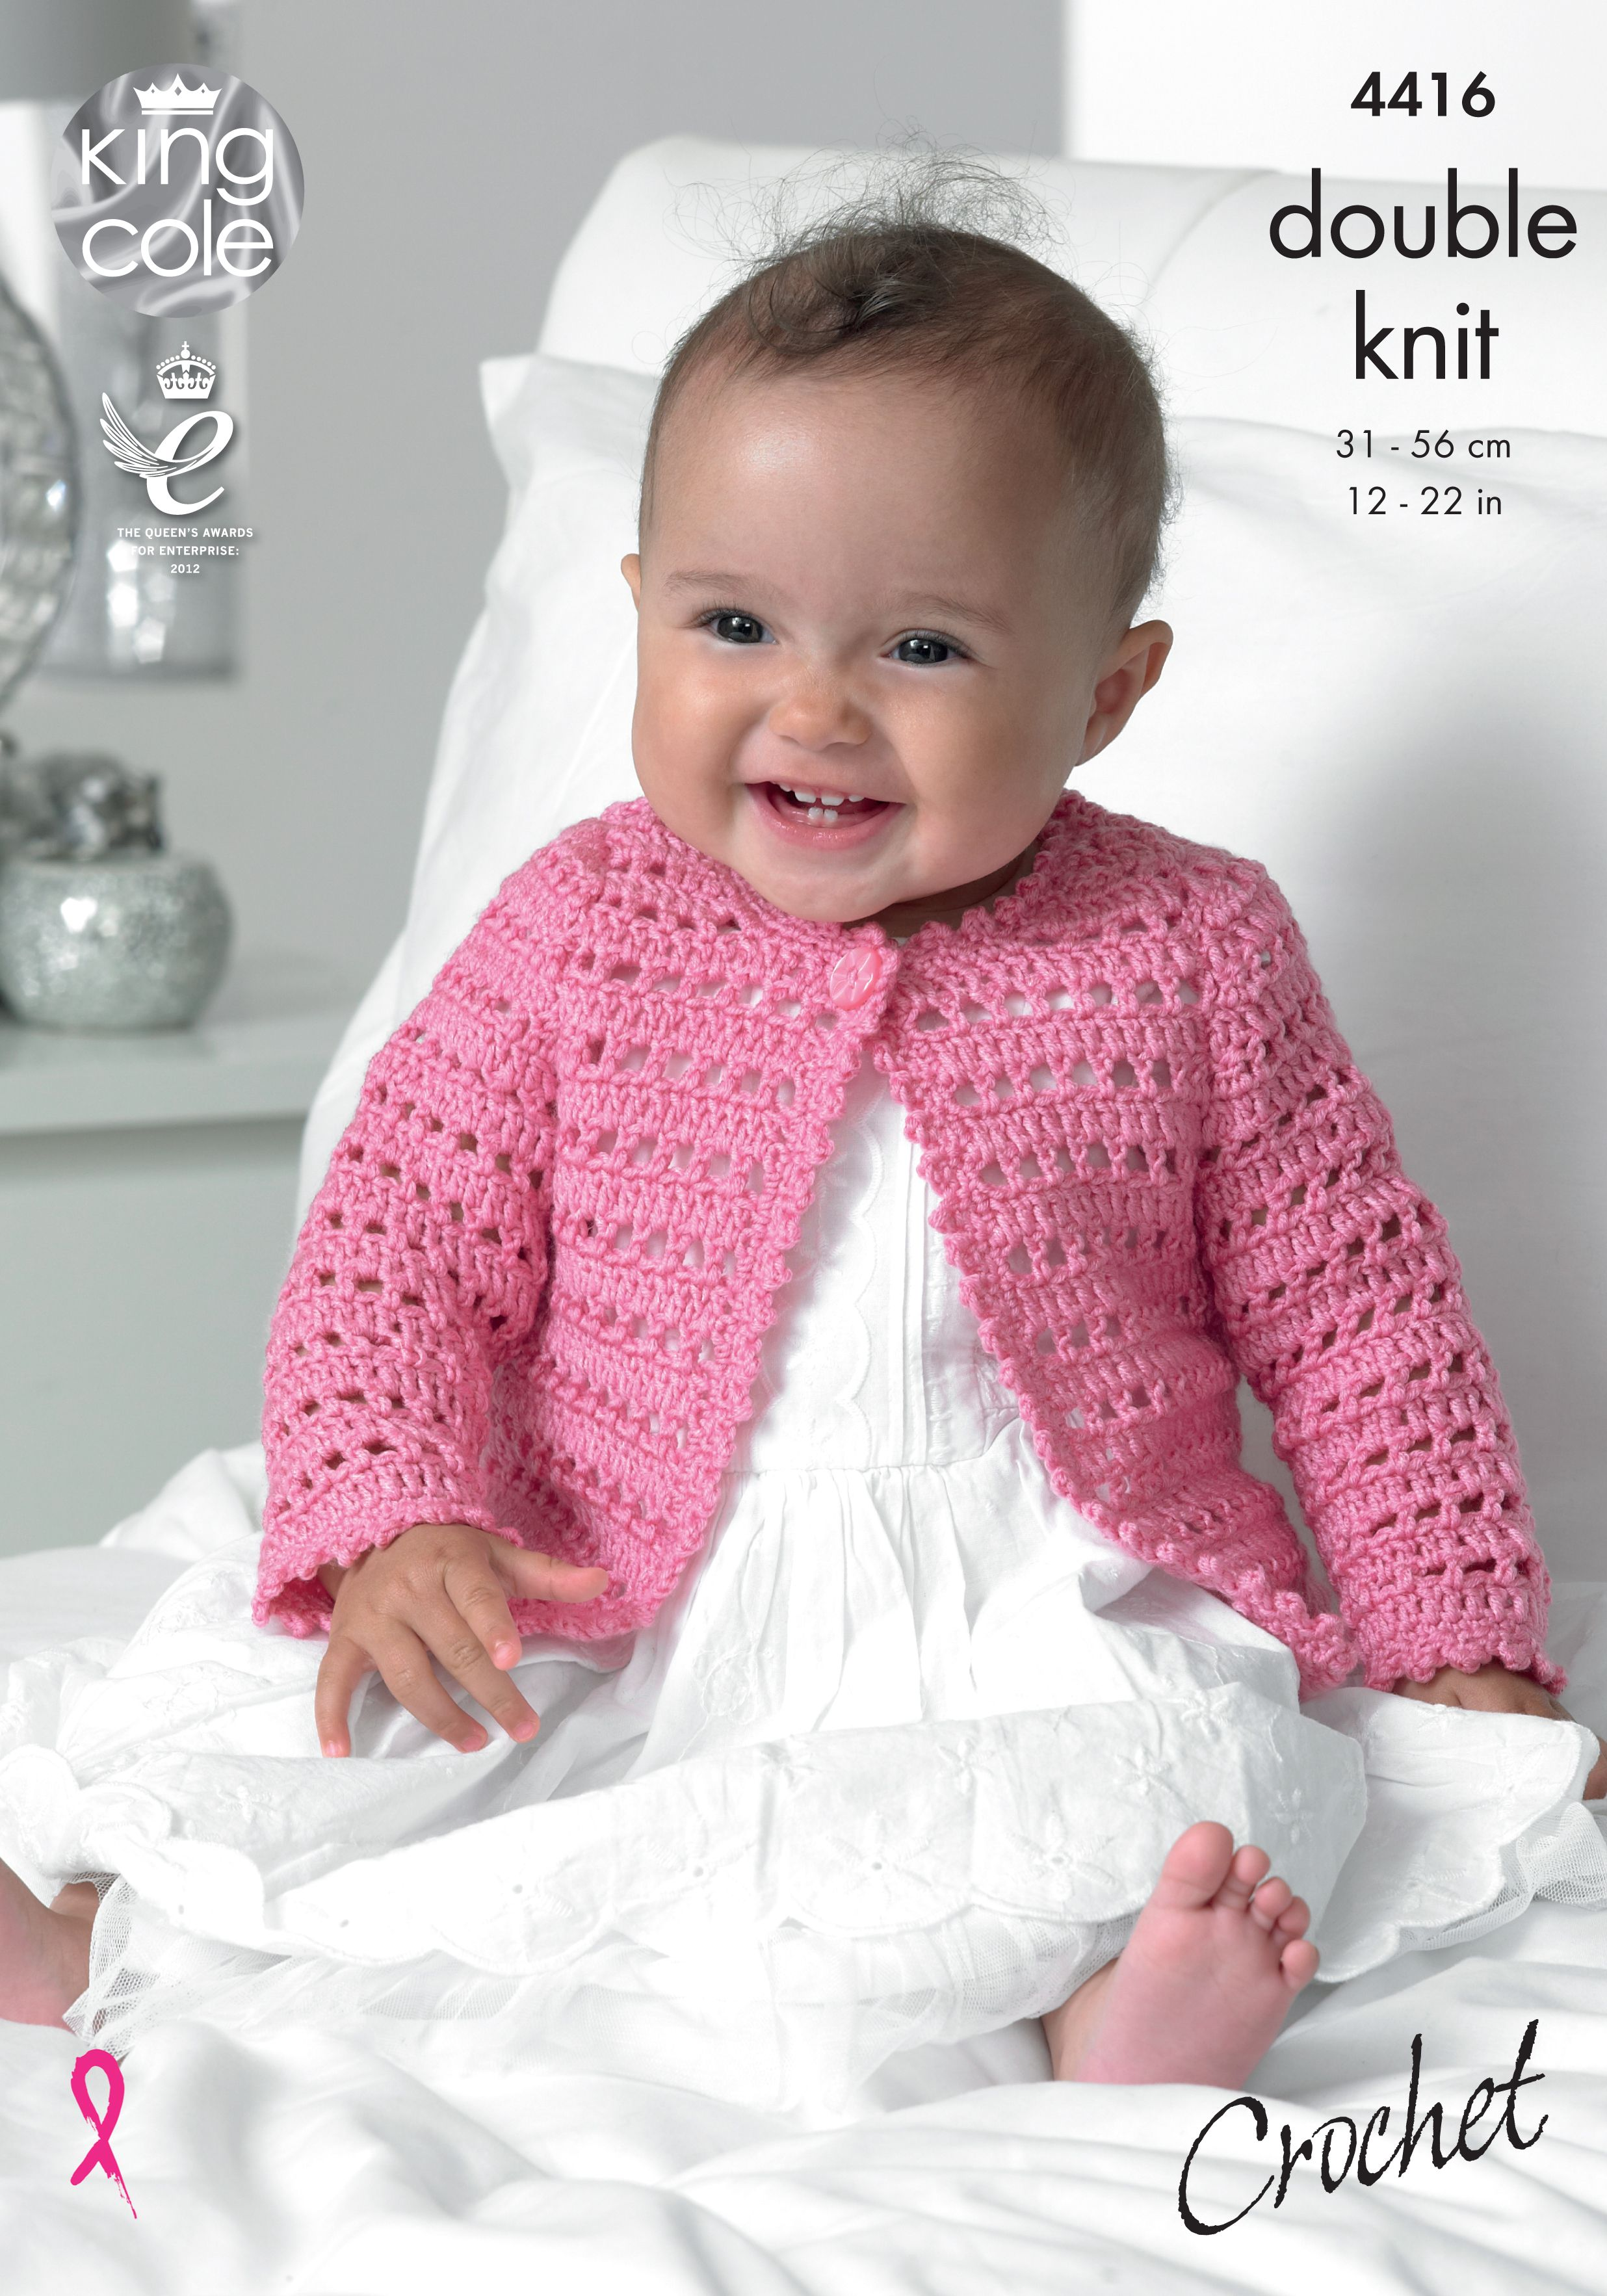 Crochet baby cardigan - King Cole … | Pinteres…